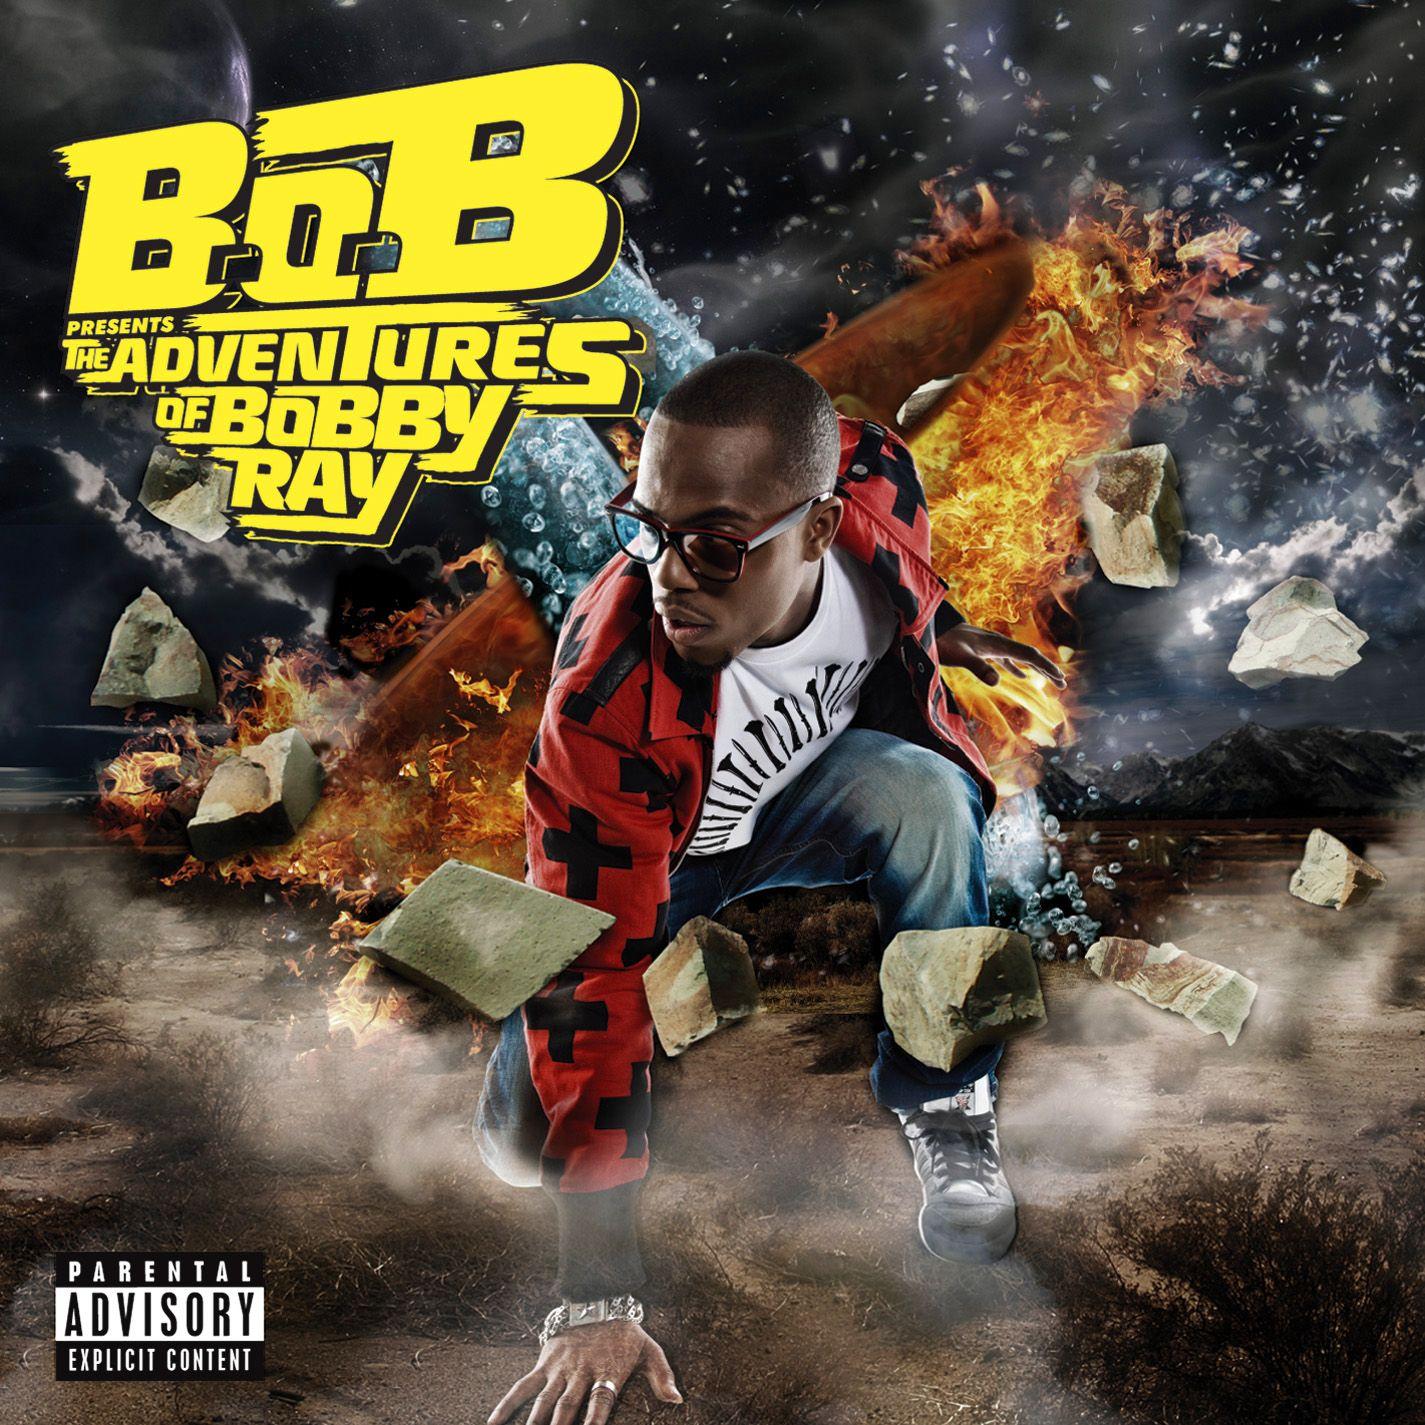 B.o.B - B.o.b Presents: The Adventures Of Bobby Ray album cover